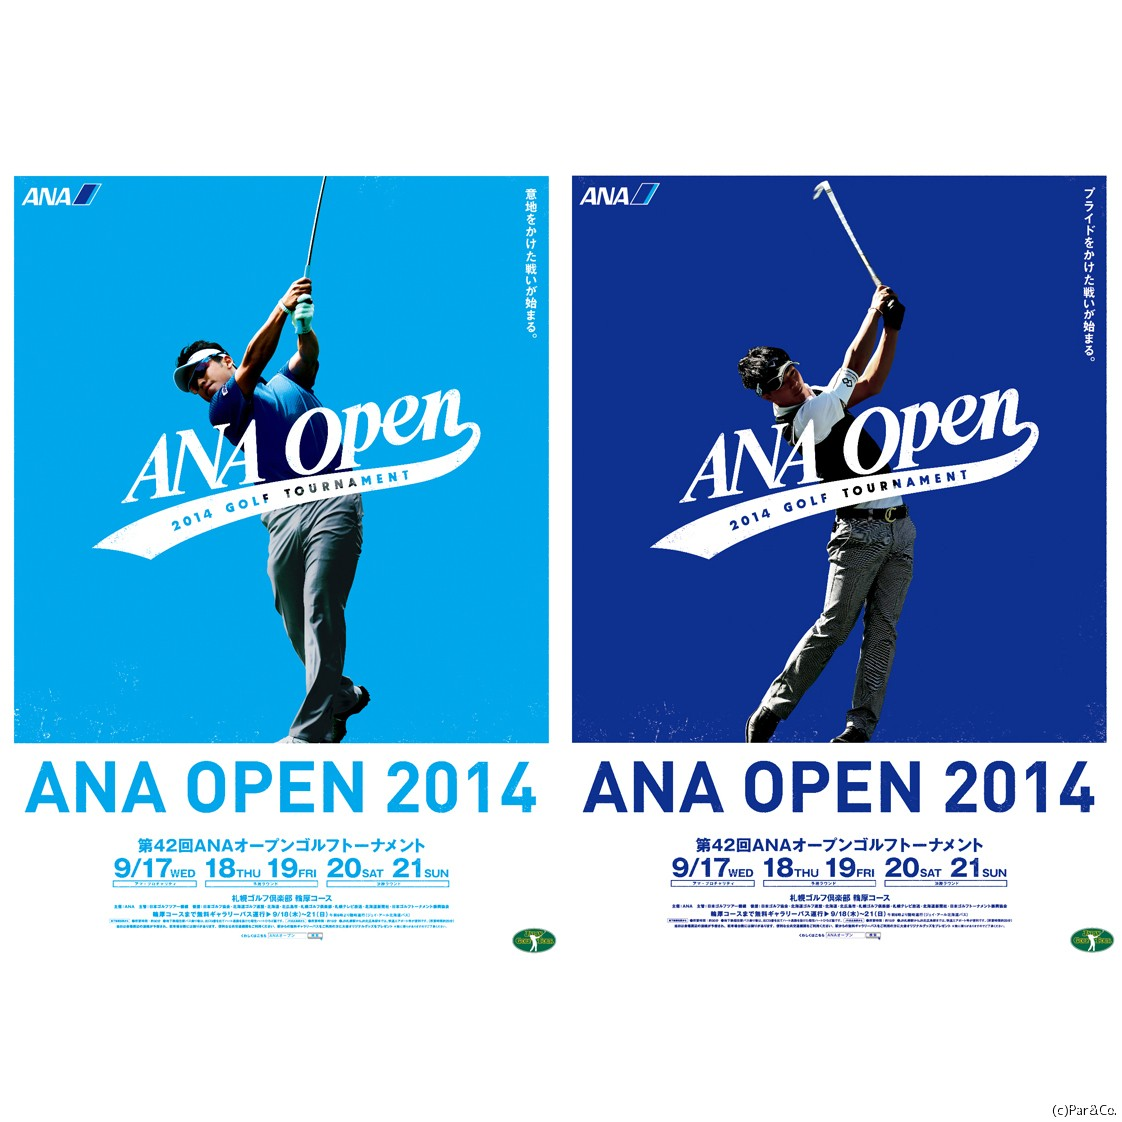 ANAオープンゴルフトーナメント関連ニュースPargolf Members最新トピックスアクセスランキングツアー・トーナメントフォトギャラリートーナメントプロ公式サイト・ブログApplication・ServiceMagazinethe PARtner for GOLFers